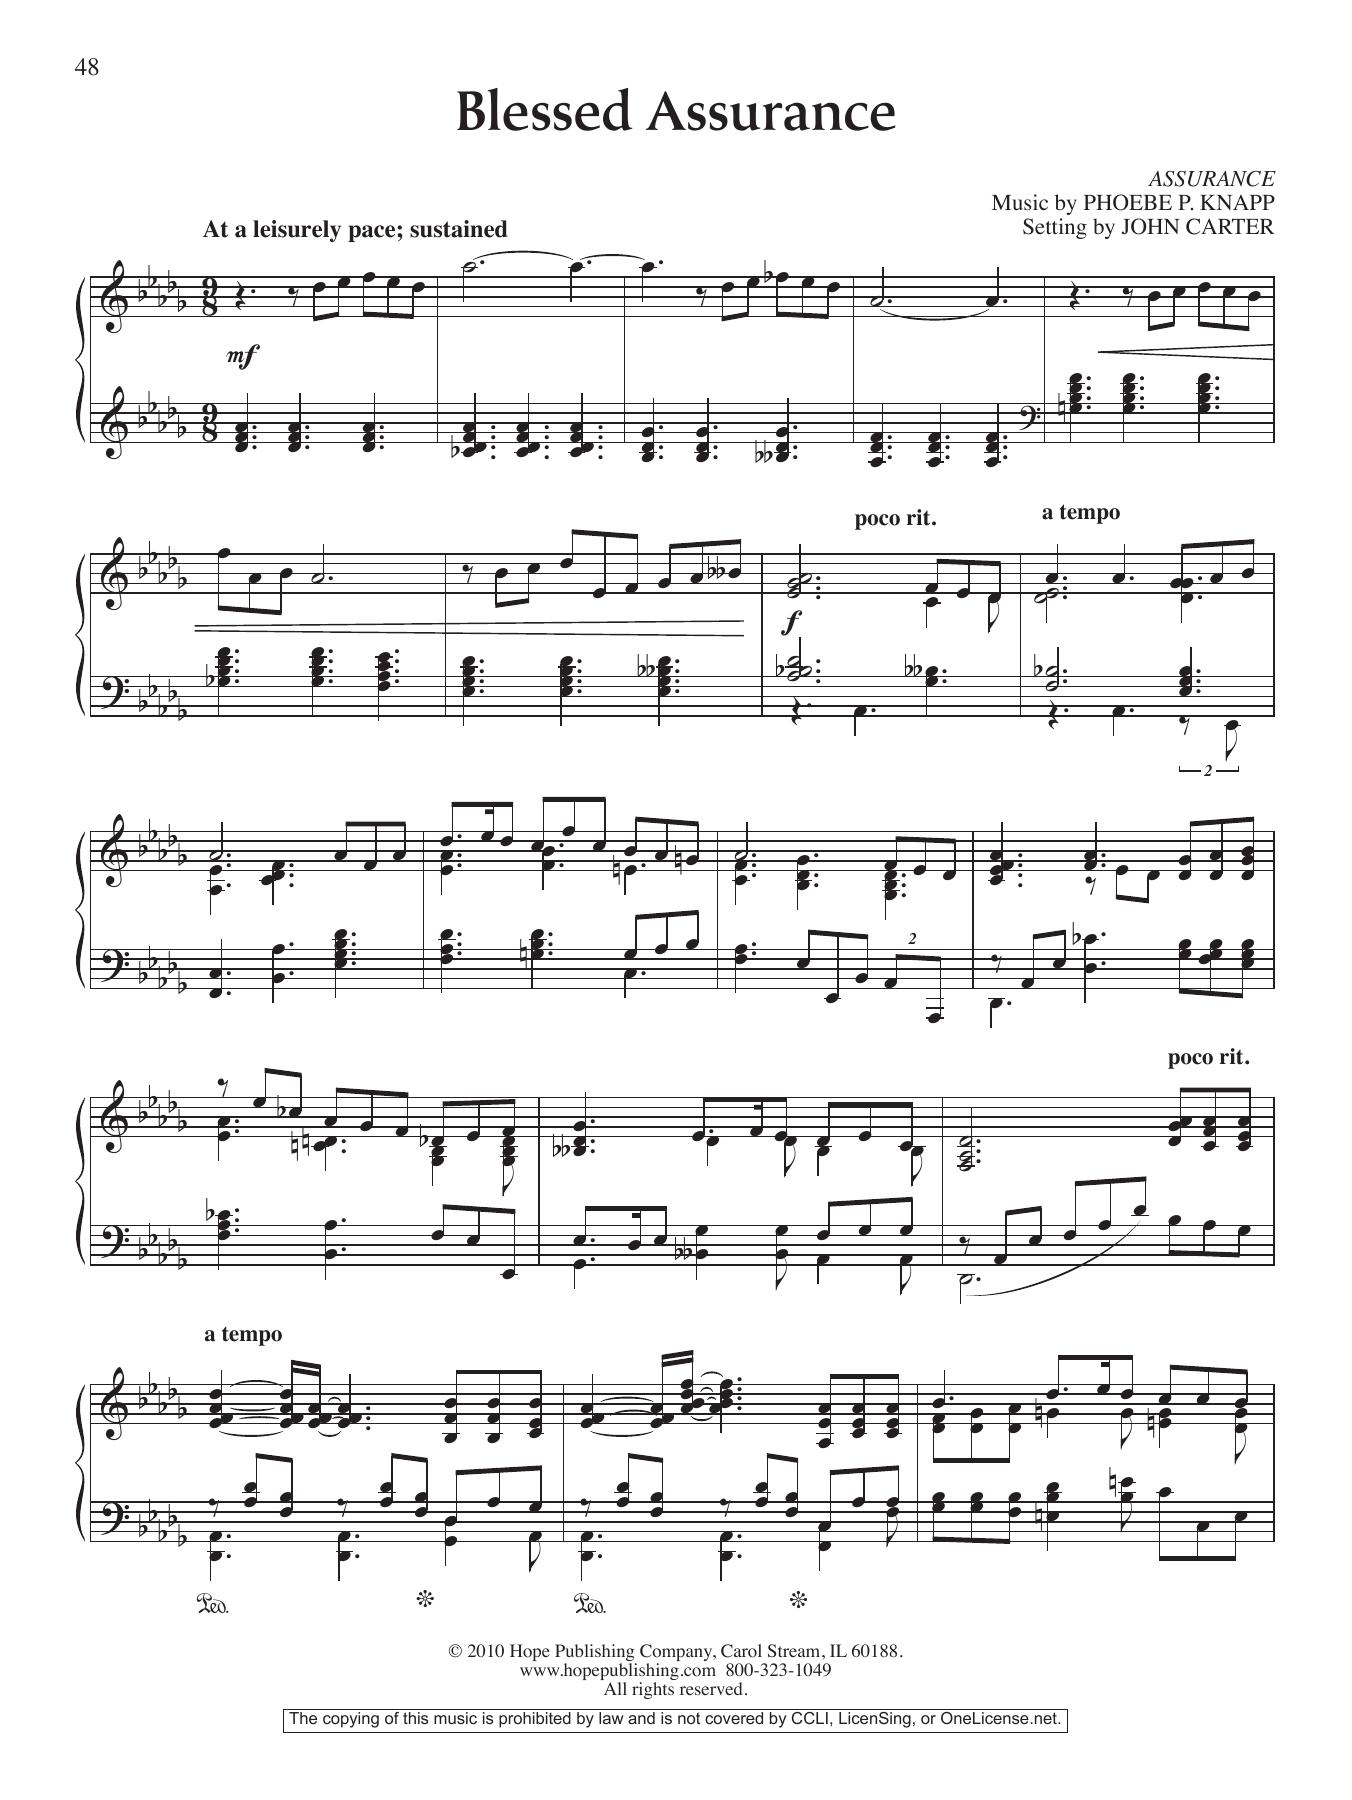 Sax Tenor Music Grace Solo Amazing Sheet